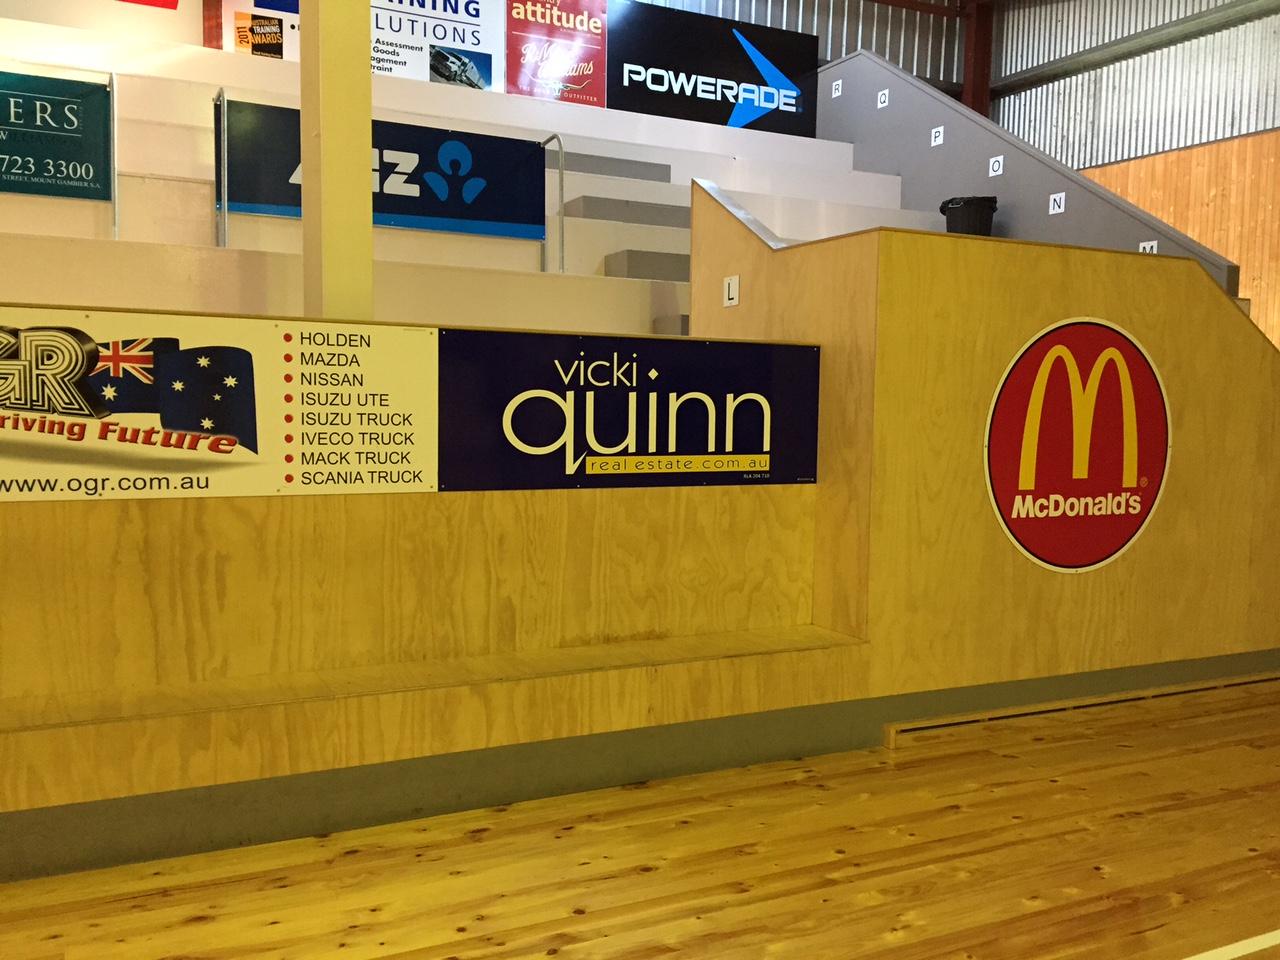 Vicki Quinn Real Estate Stadium Sign